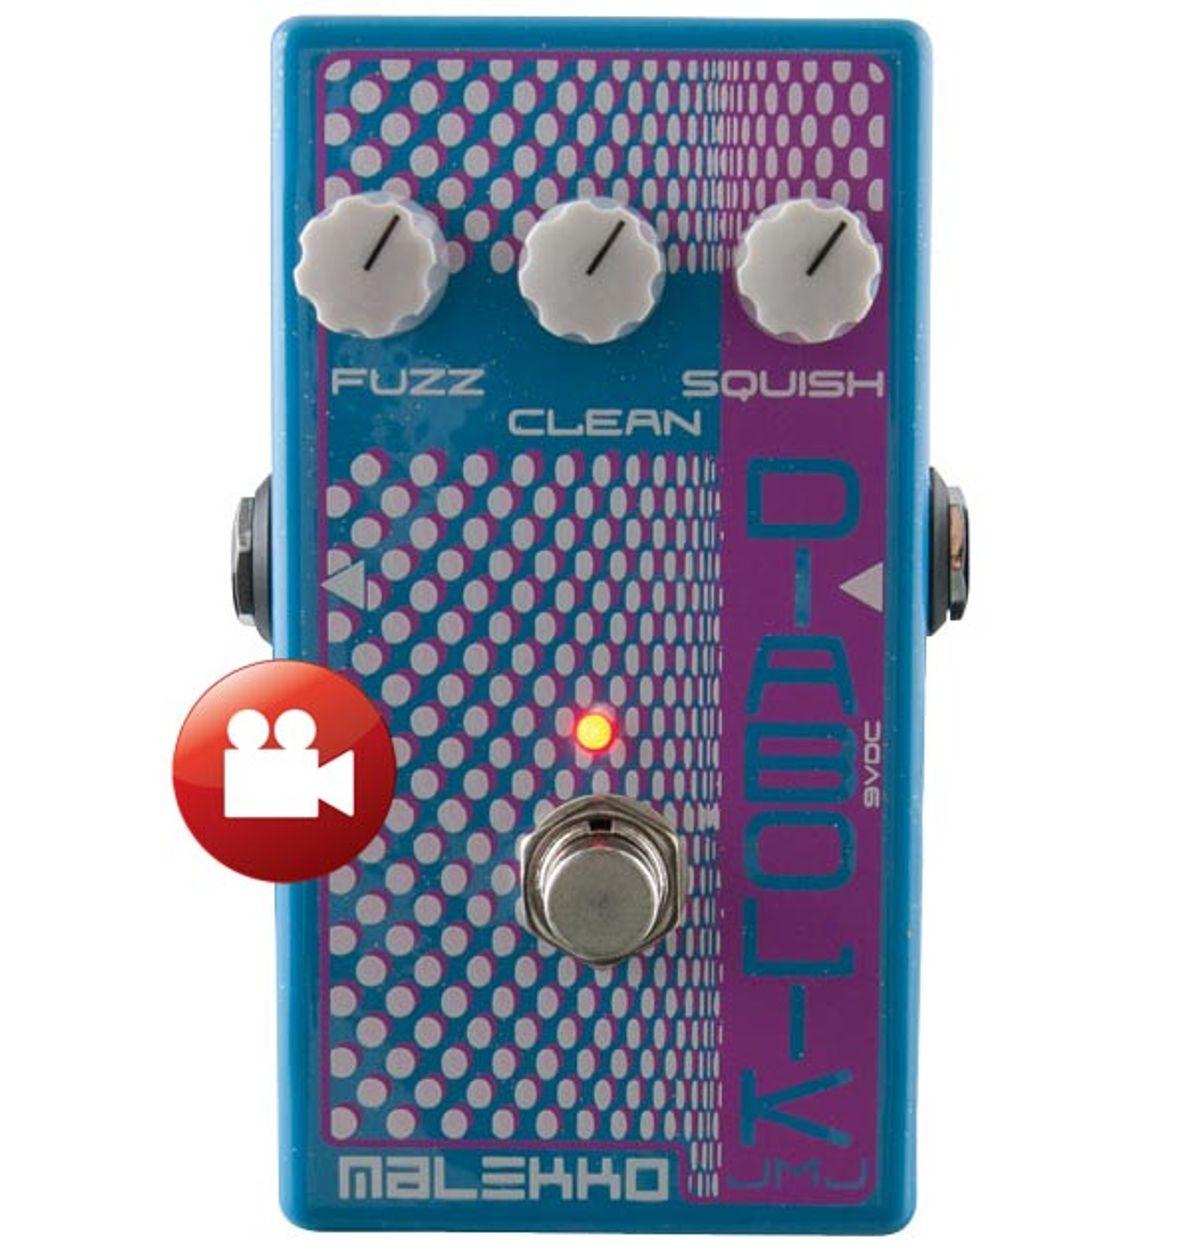 Malekko Diabolik Bass Fuzz Review